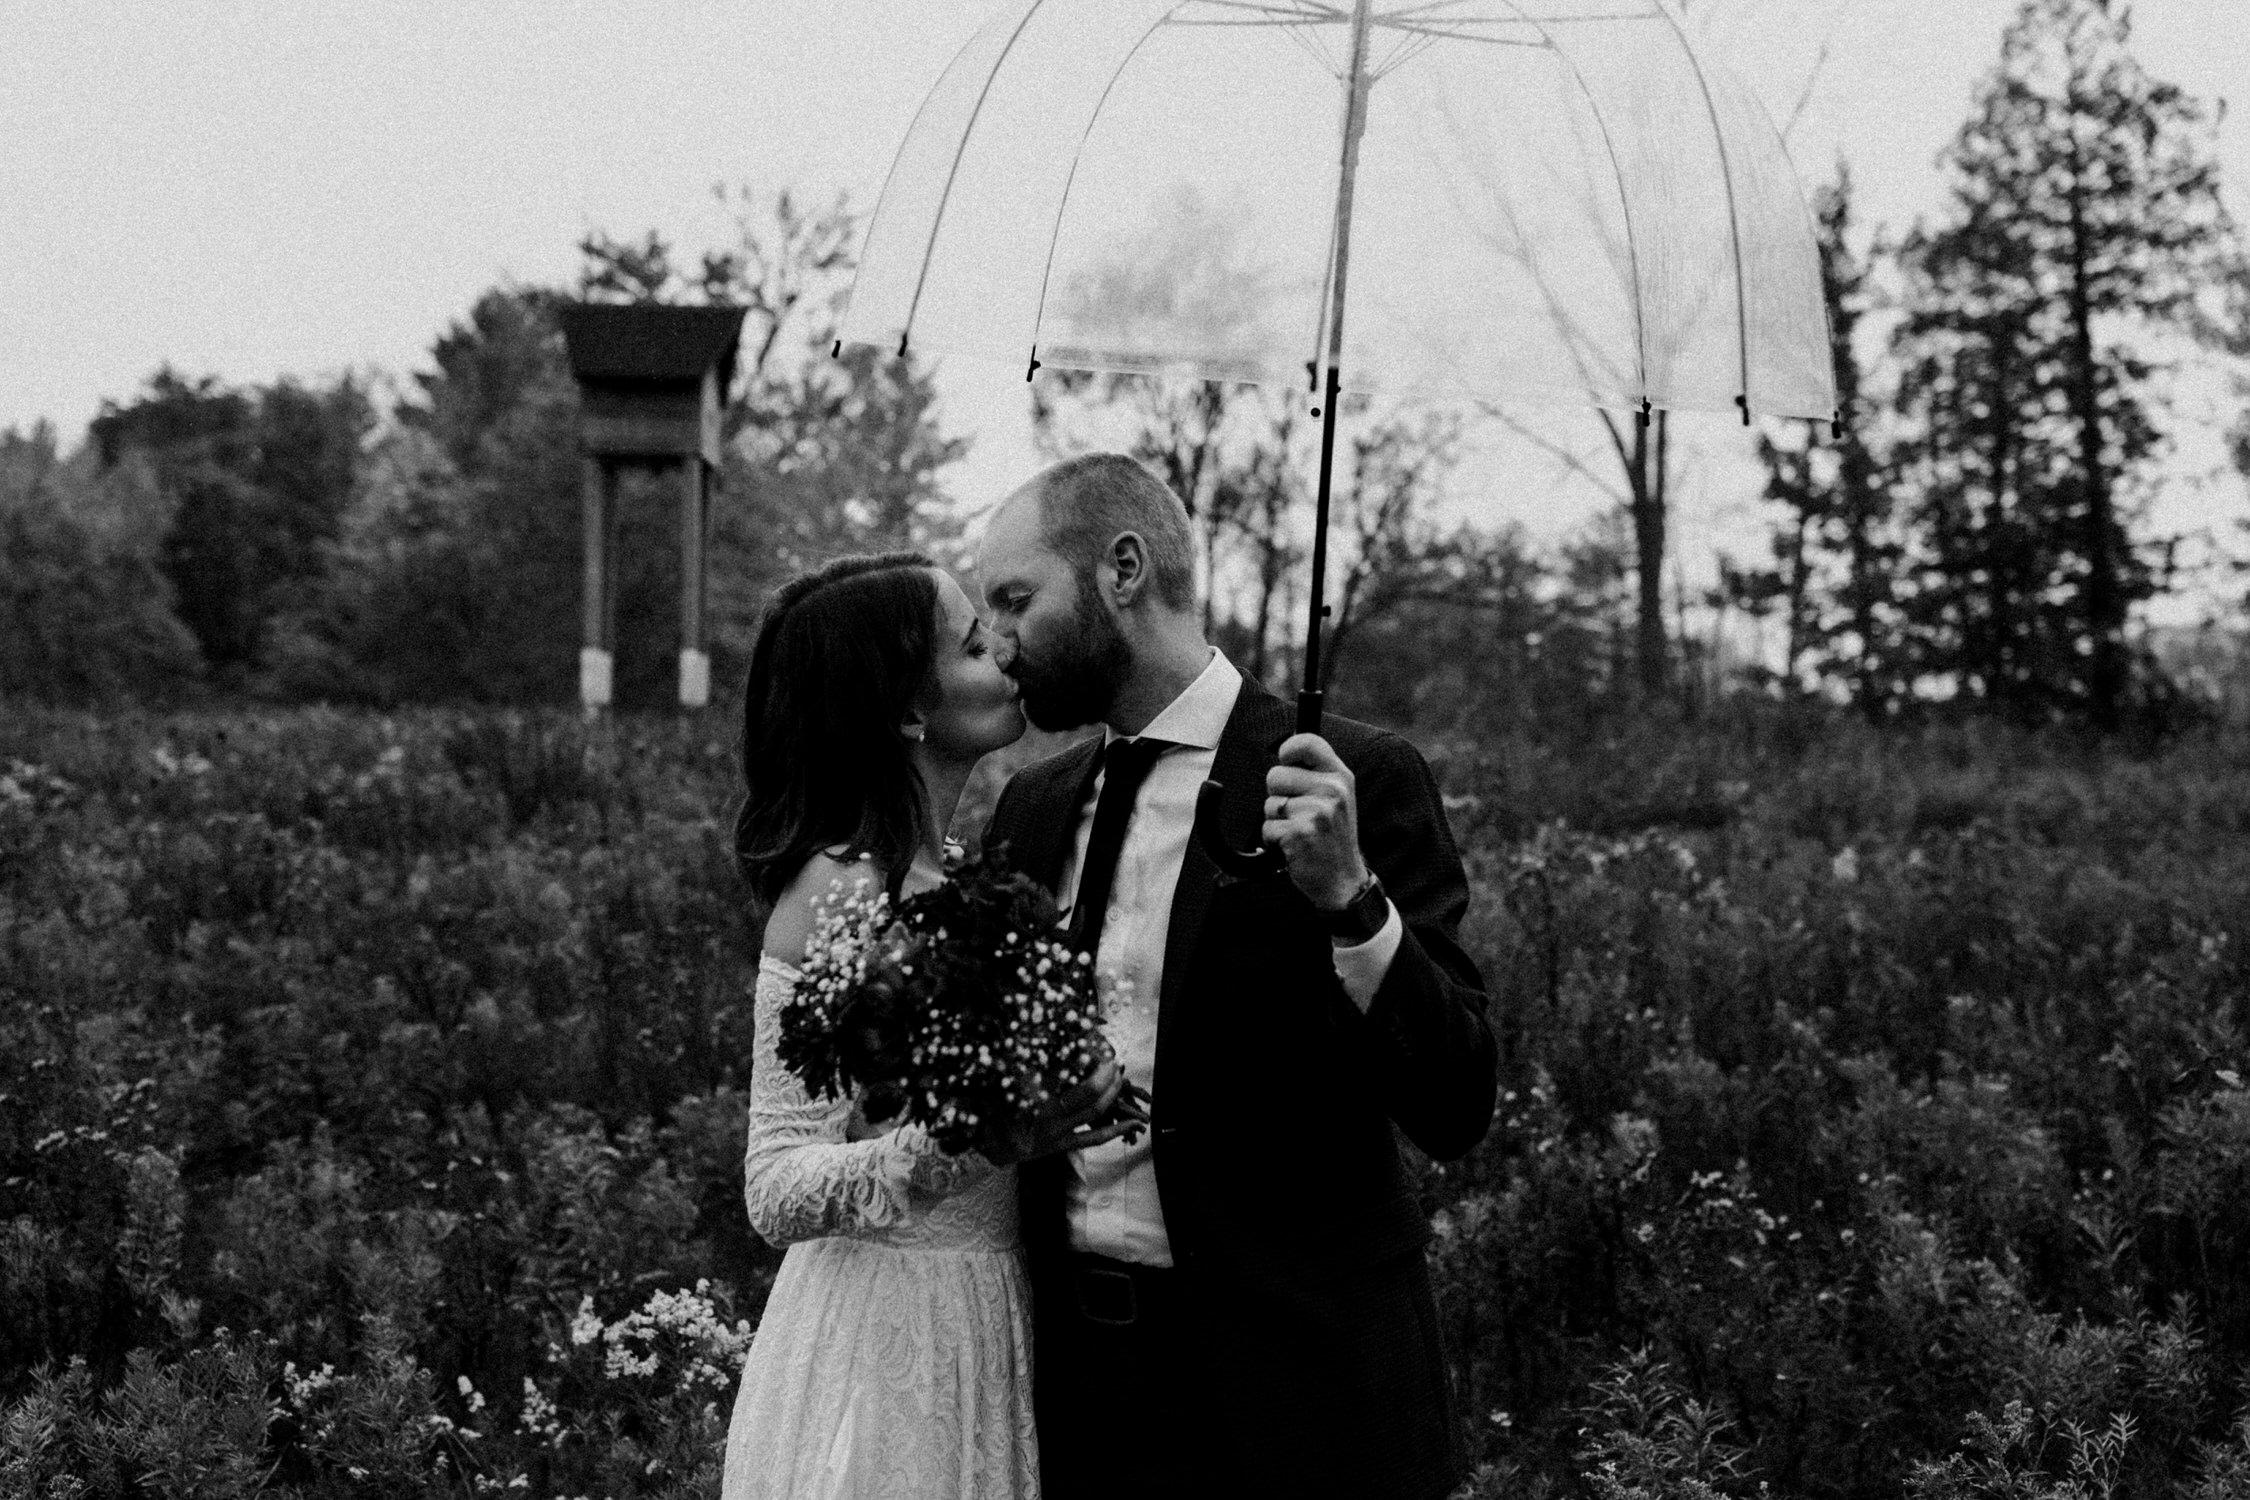 Bride and groom kiss under umbrella in field - Huron Natural Area Micro Wedding Kitchener, Ontario